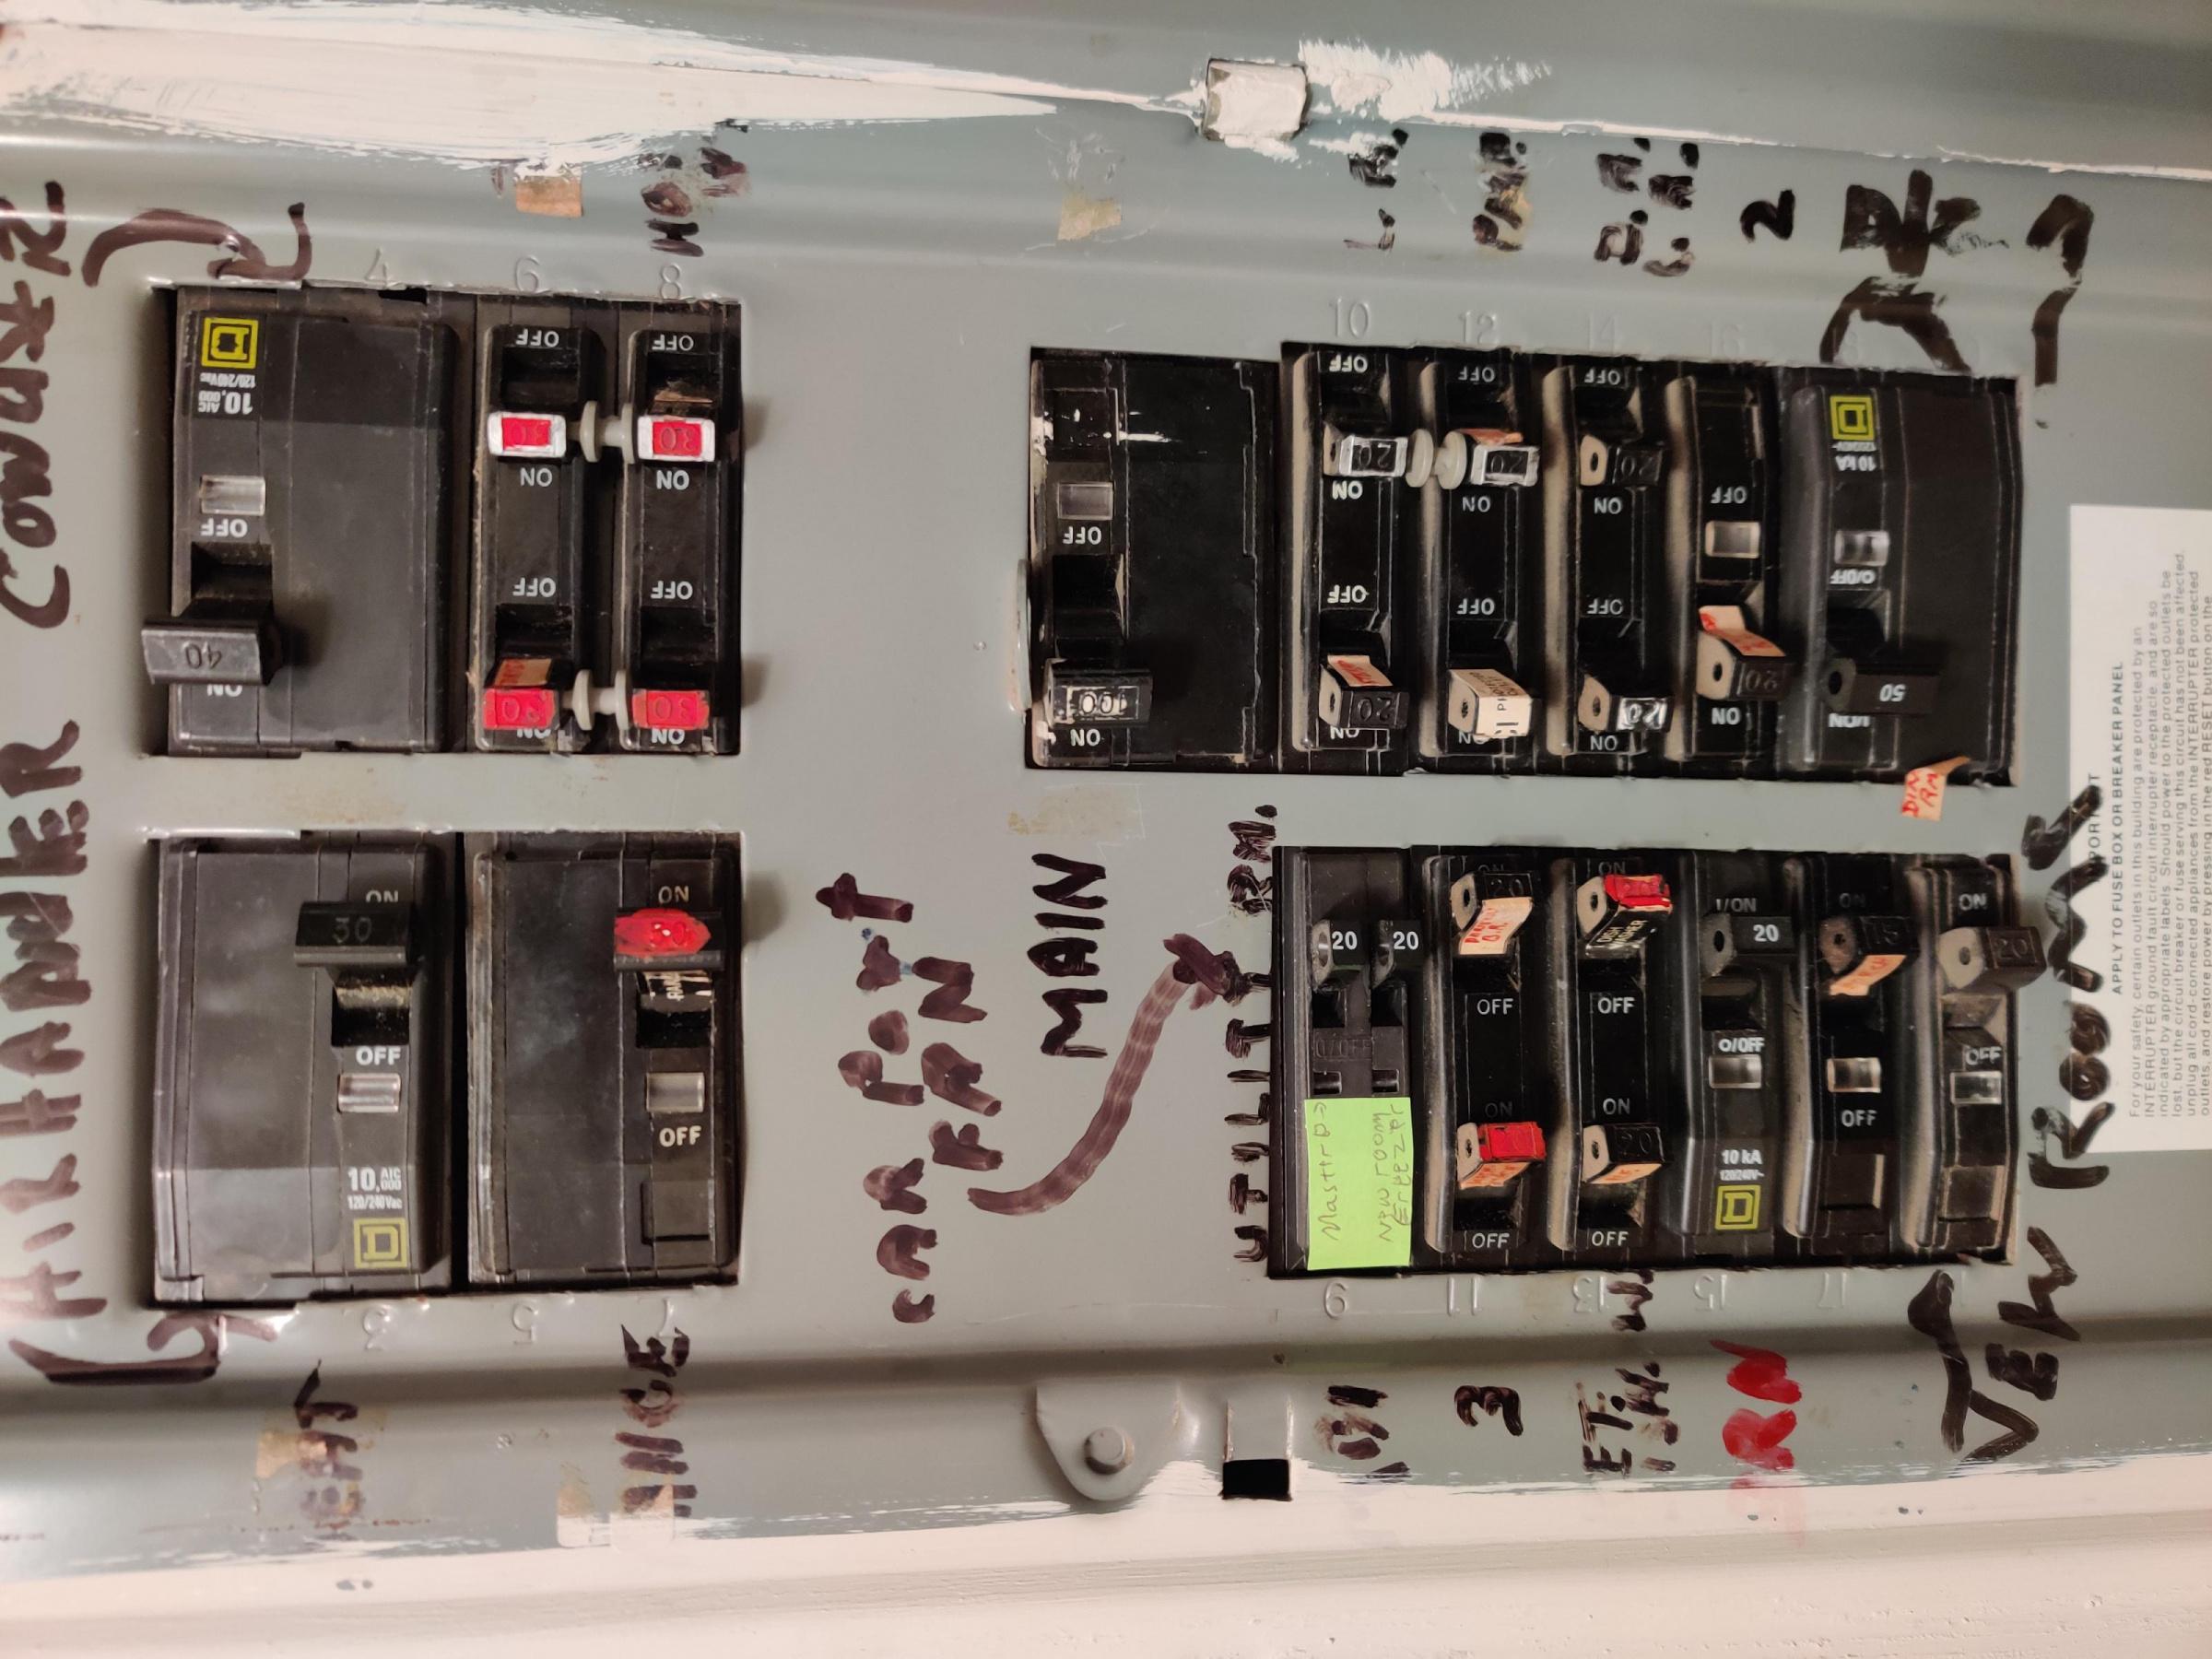 Unusual  I Think  Breaker Box Layout  - Electrical